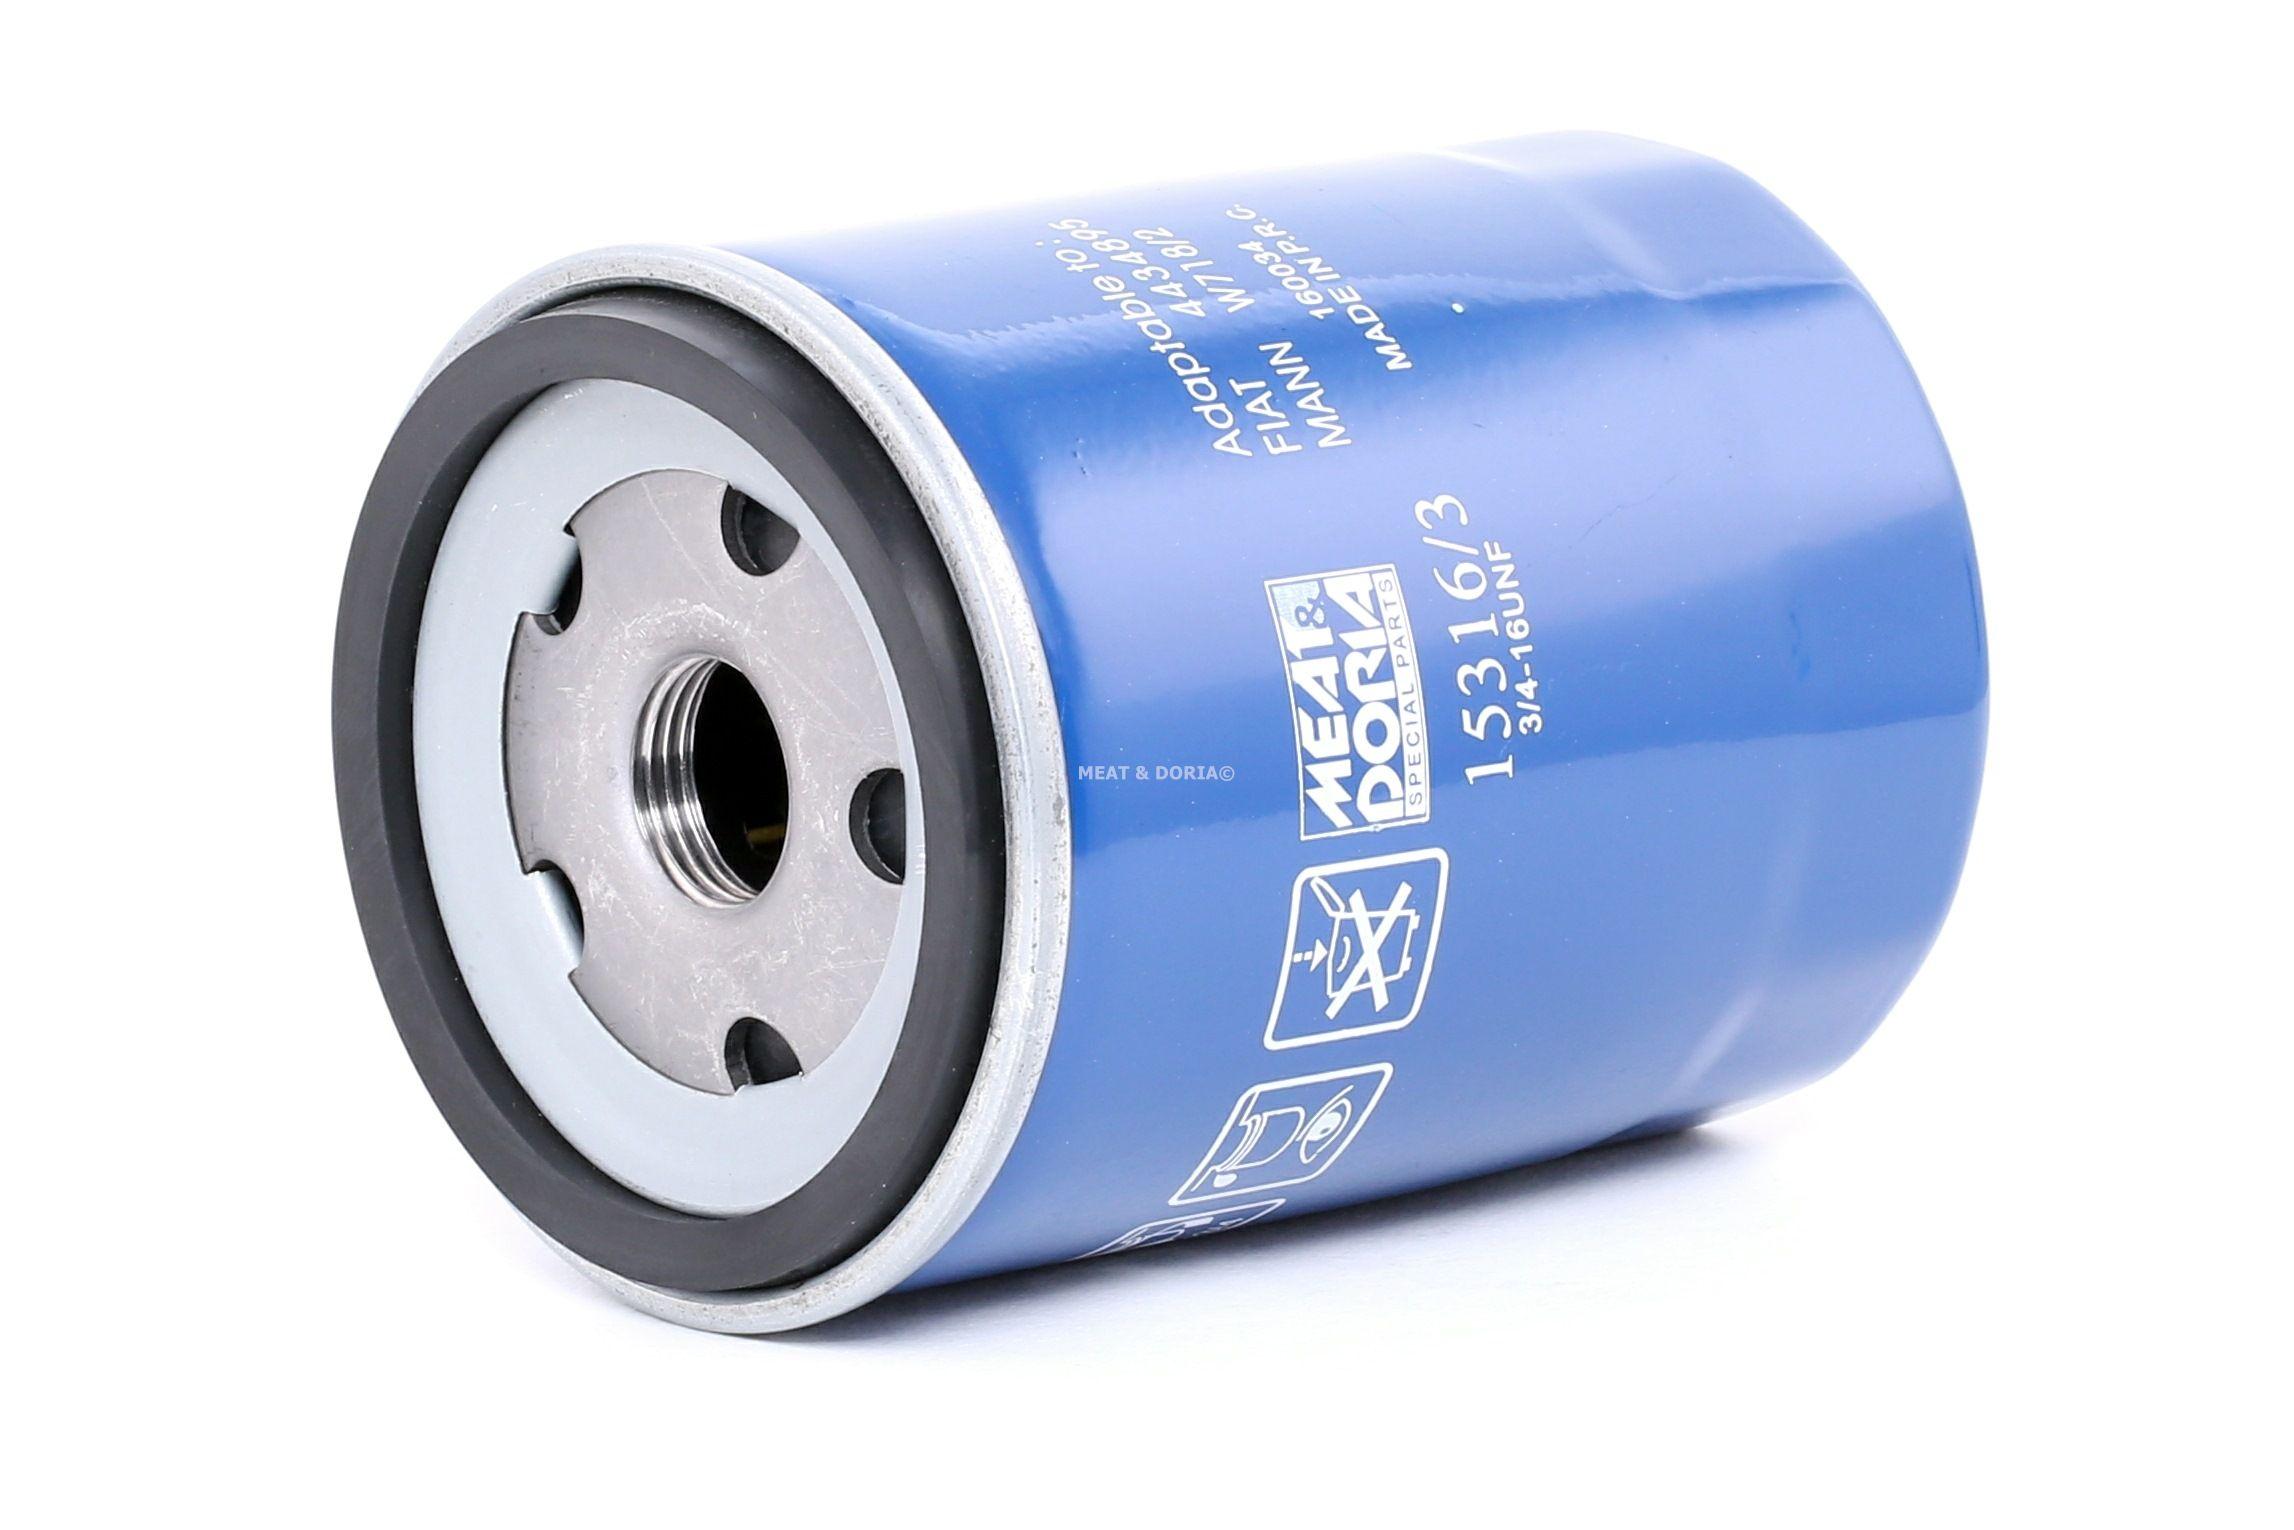 Filter MEAT & DORIA 15316/3 Bewertung